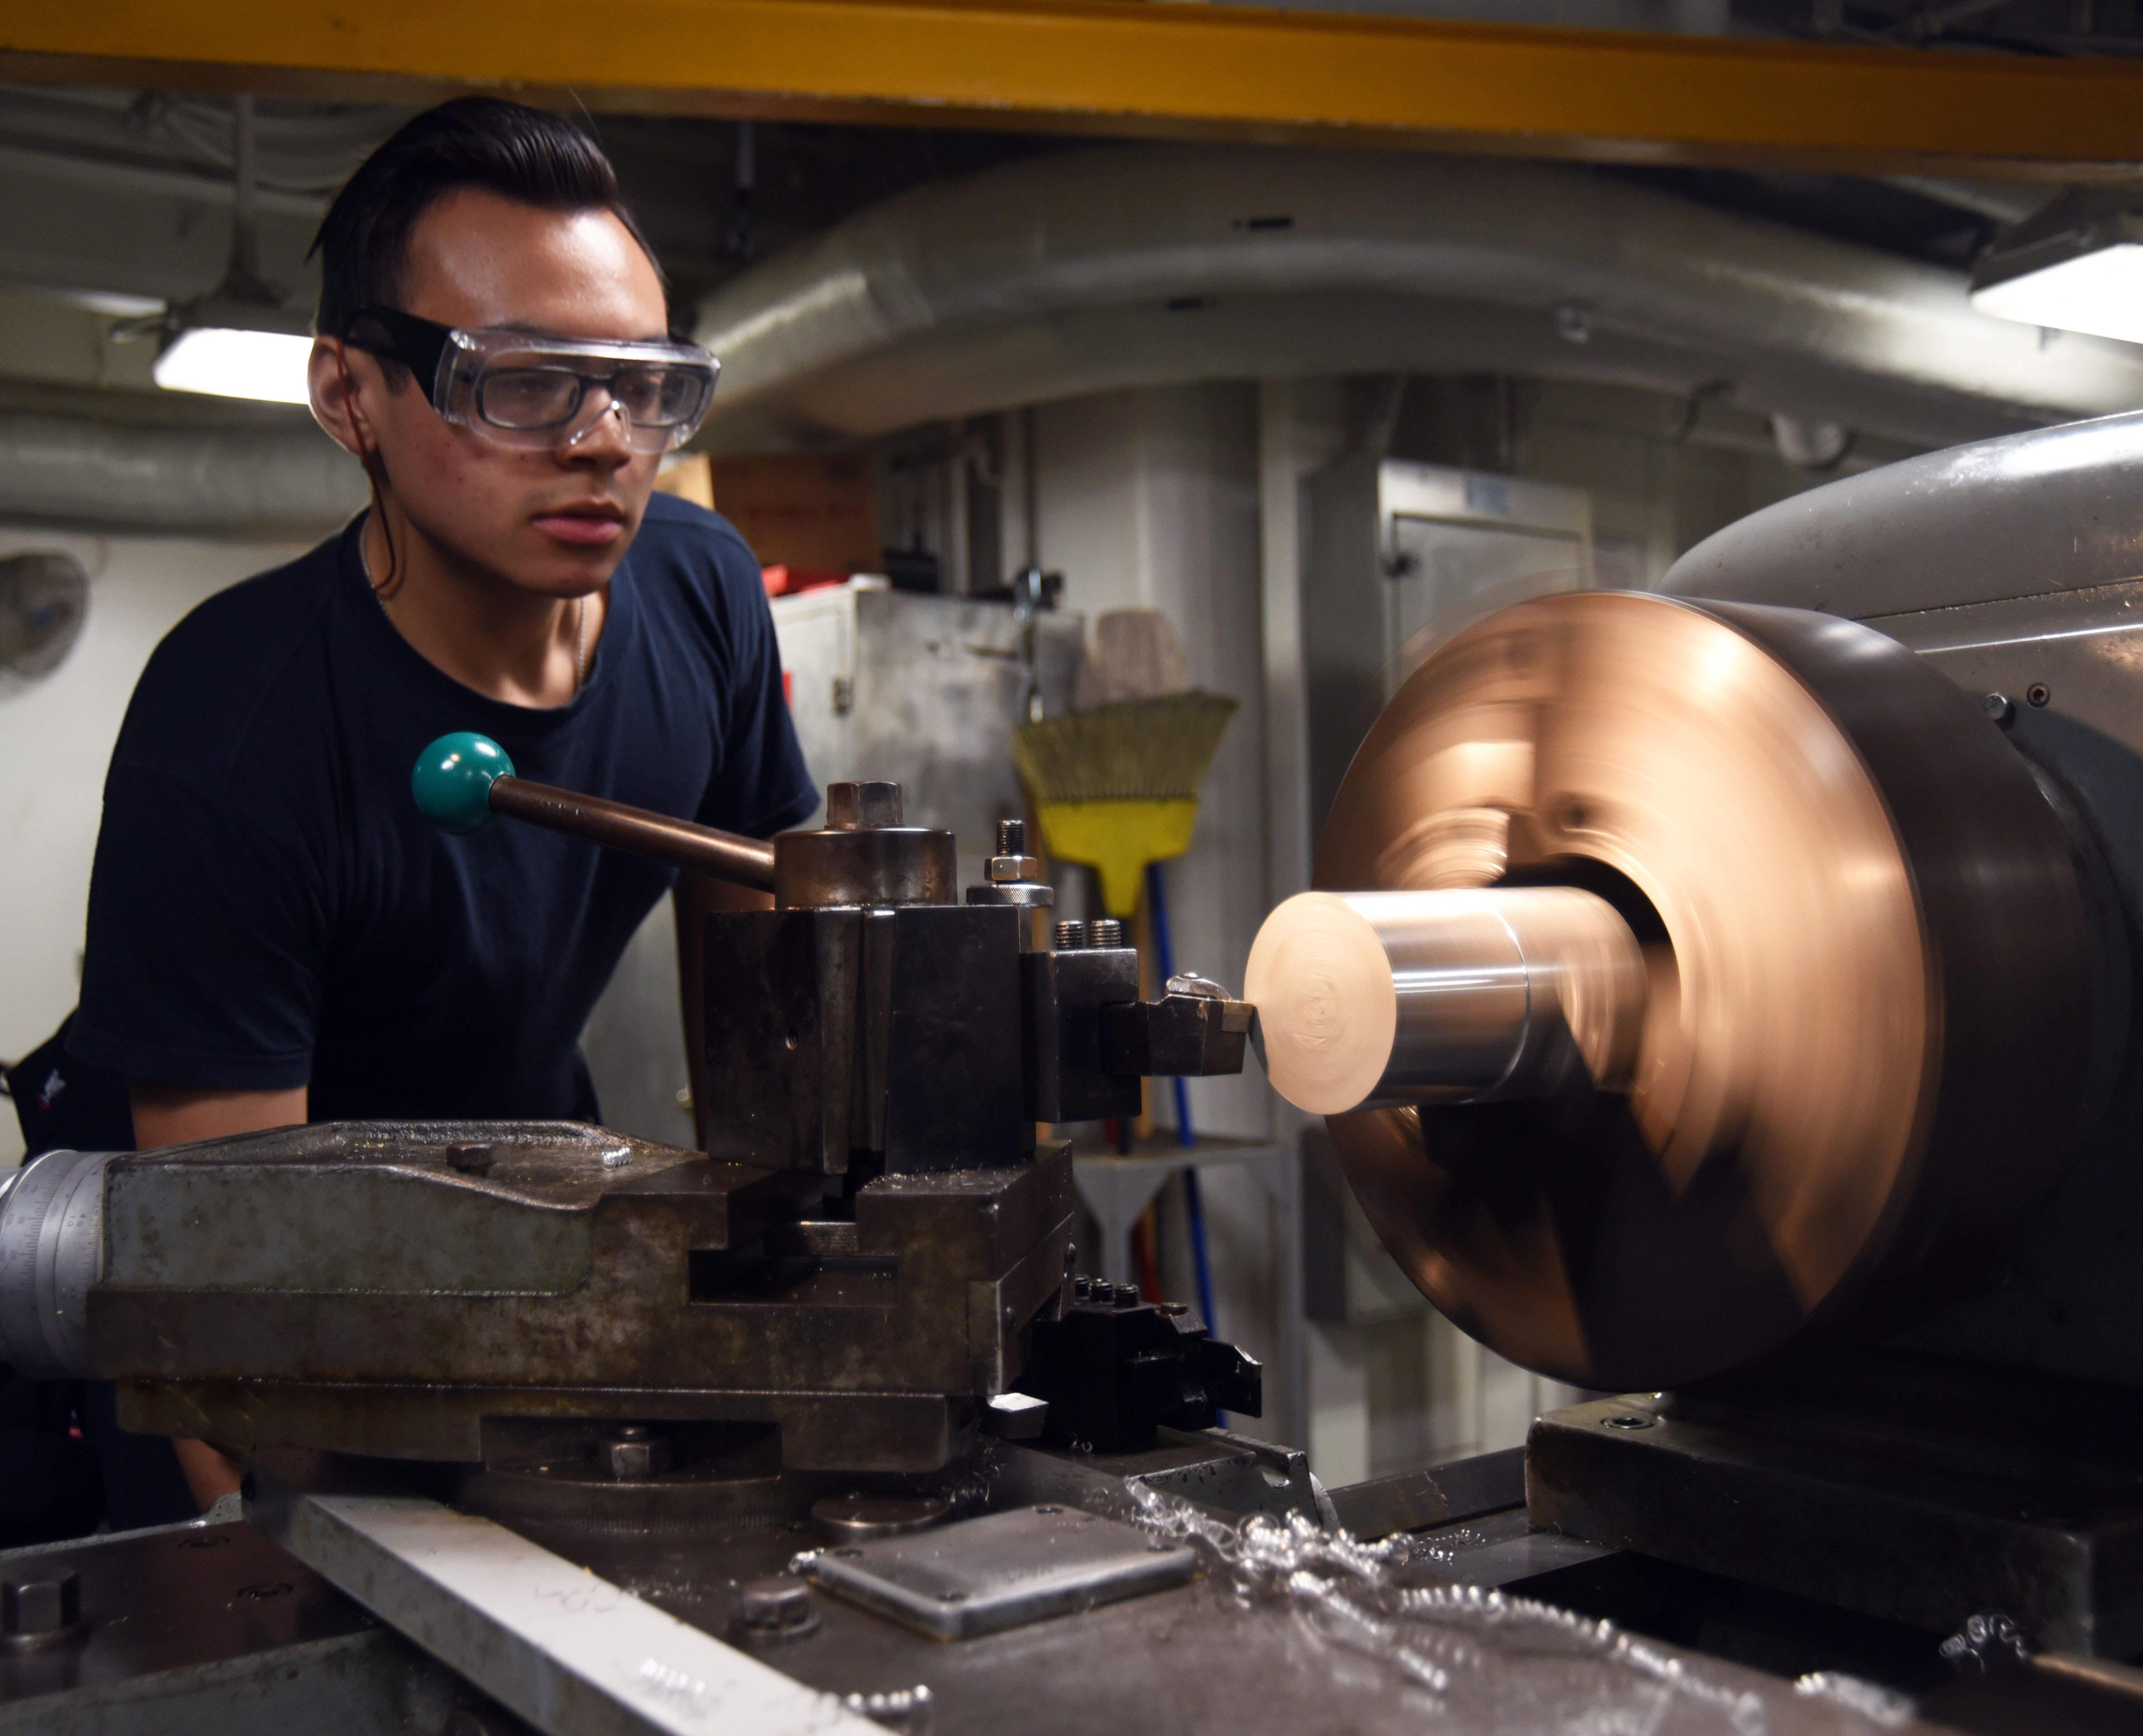 Apprenticeship Program Benefits Aircraft Carriers Sailors US - Us map apprenticeship program